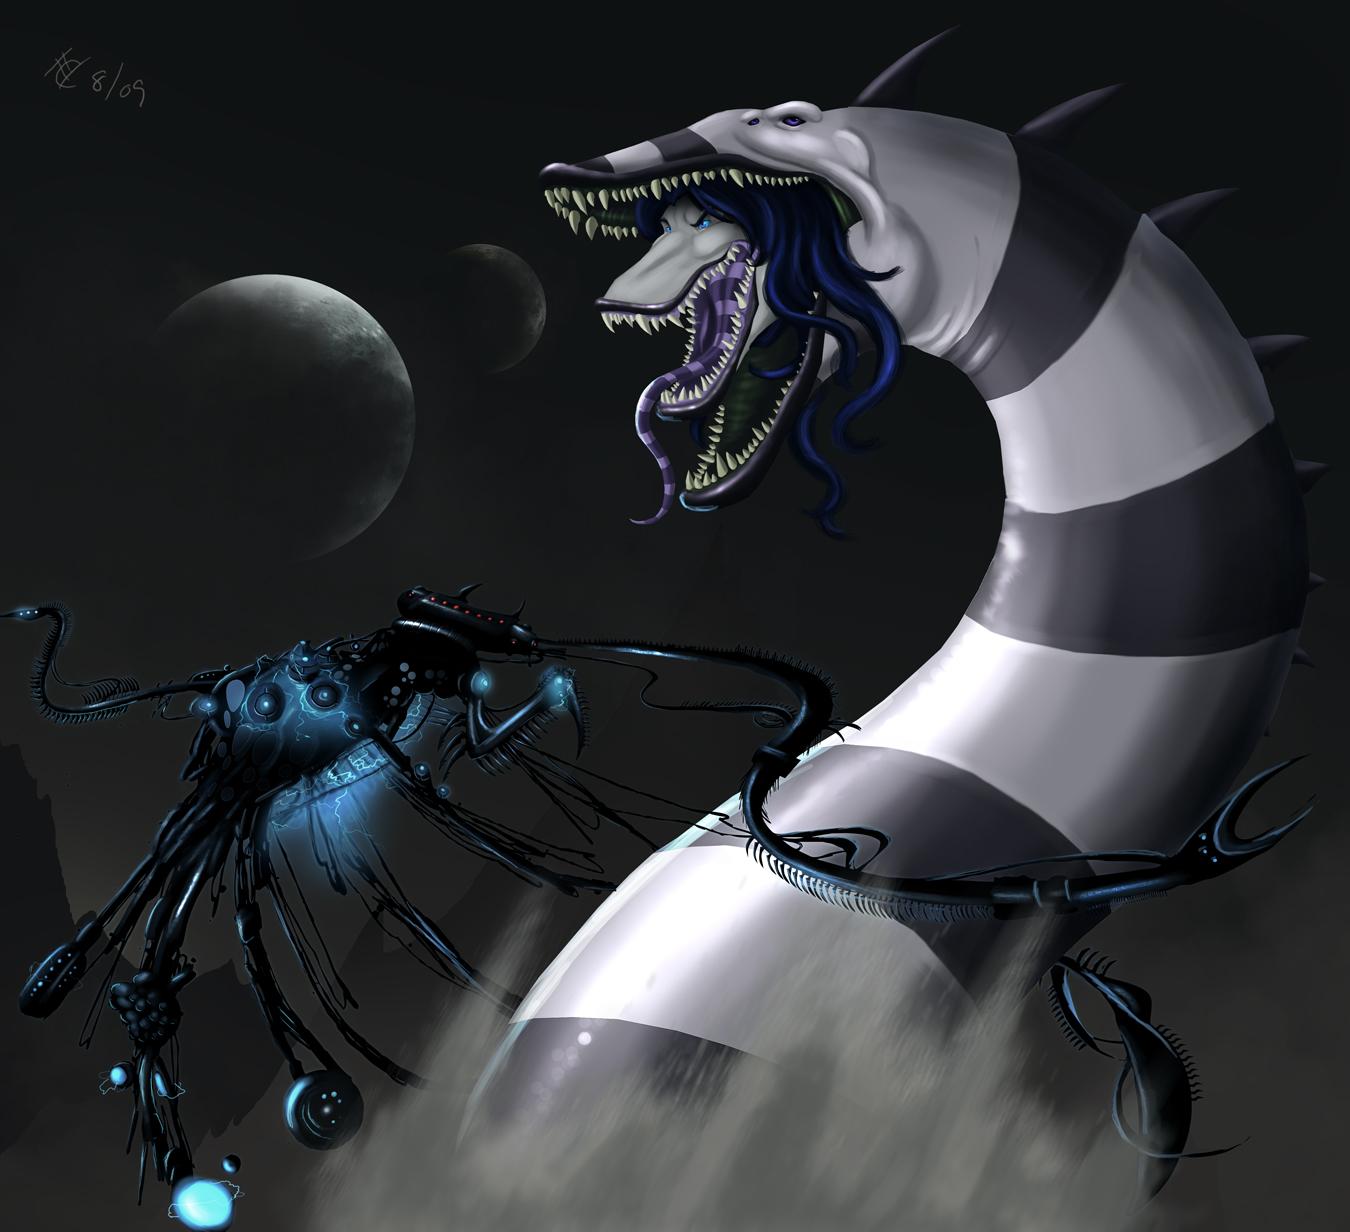 The Sandworm by Ghostwalker2061